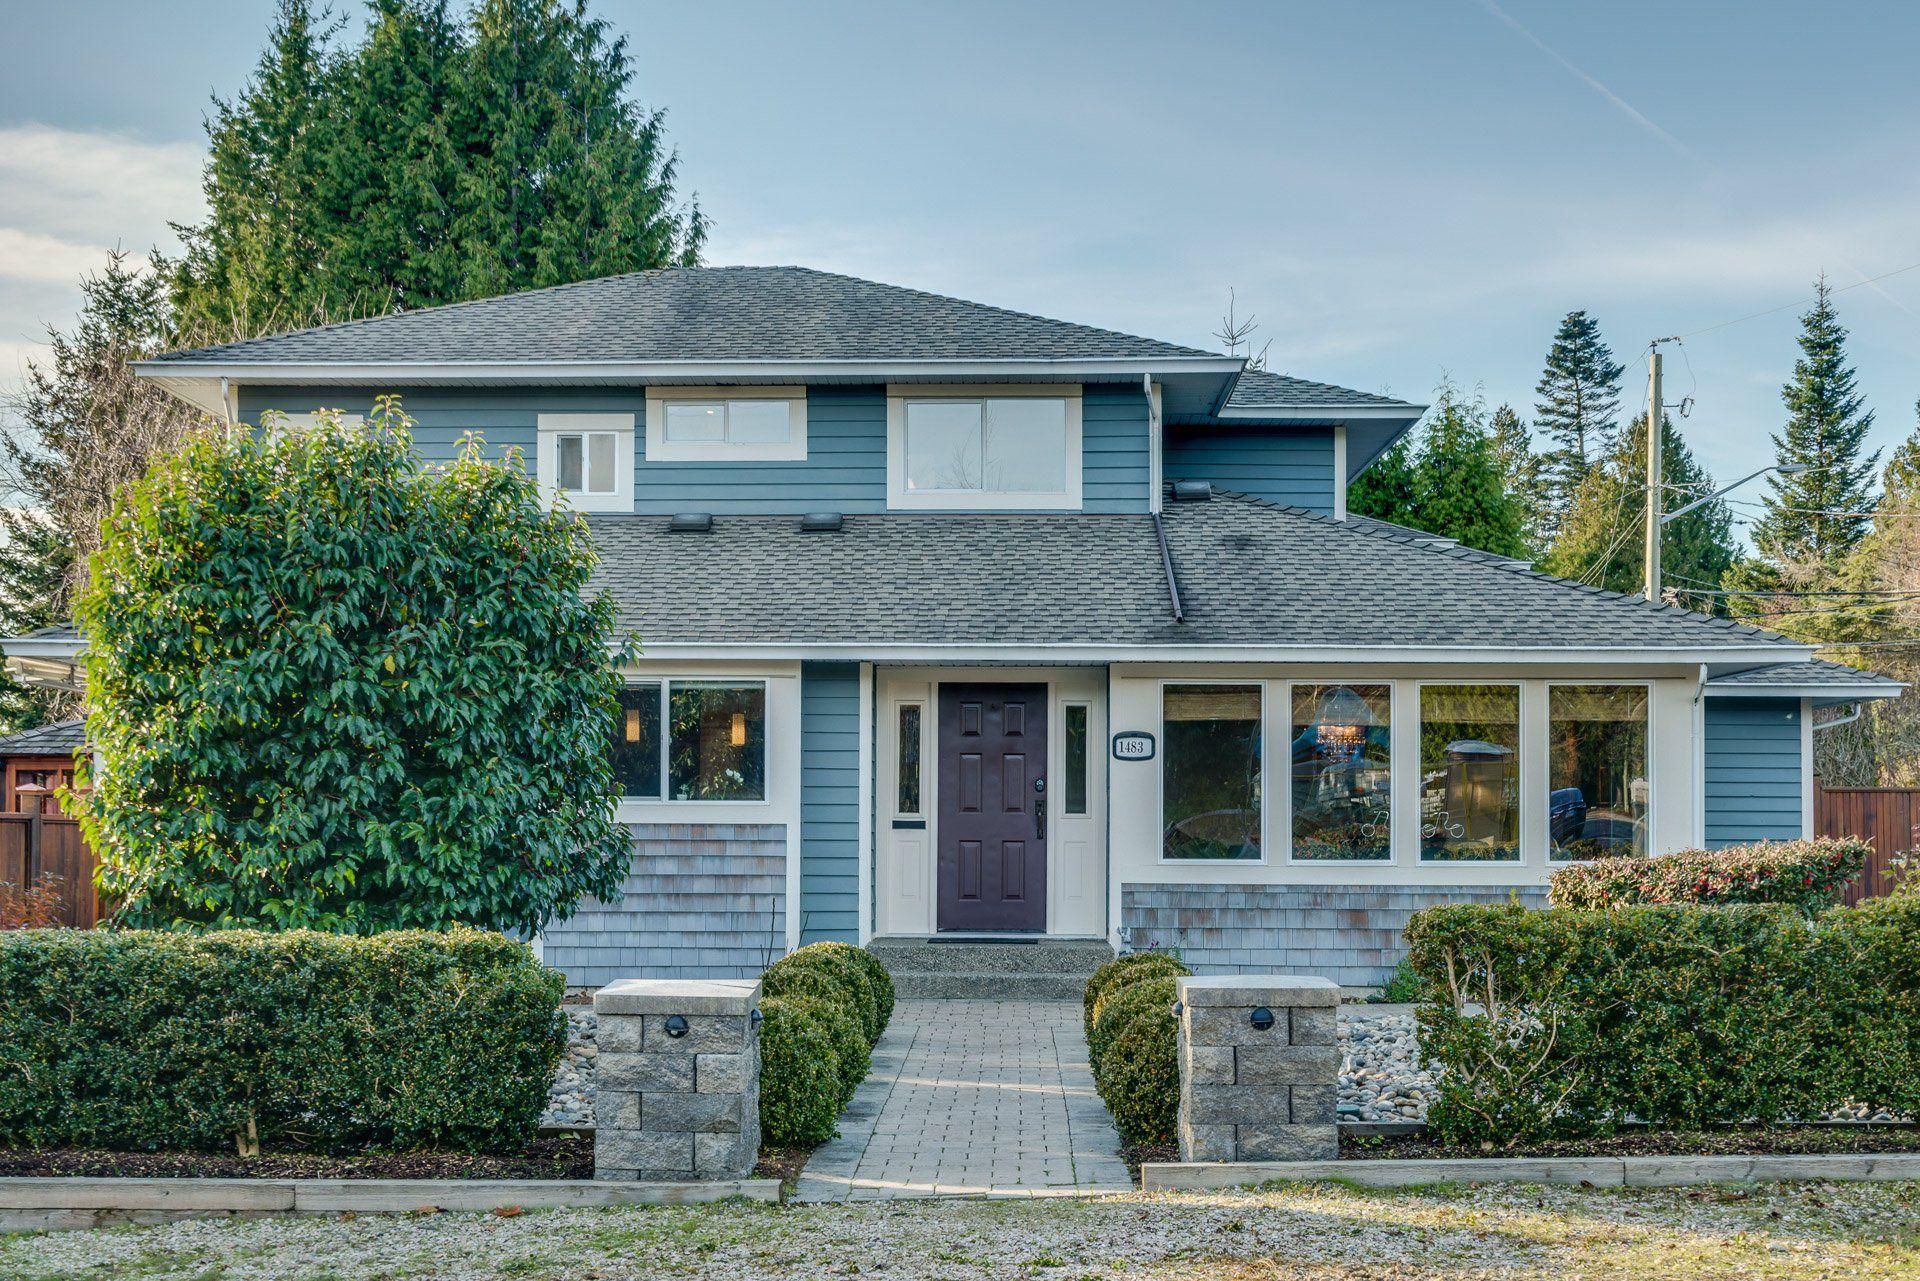 "Main Photo: 1483 136 Street in Surrey: Crescent Bch Ocean Pk. House 1/2 Duplex for sale in ""OCEAN PARK"" (South Surrey White Rock)  : MLS®# R2326975"